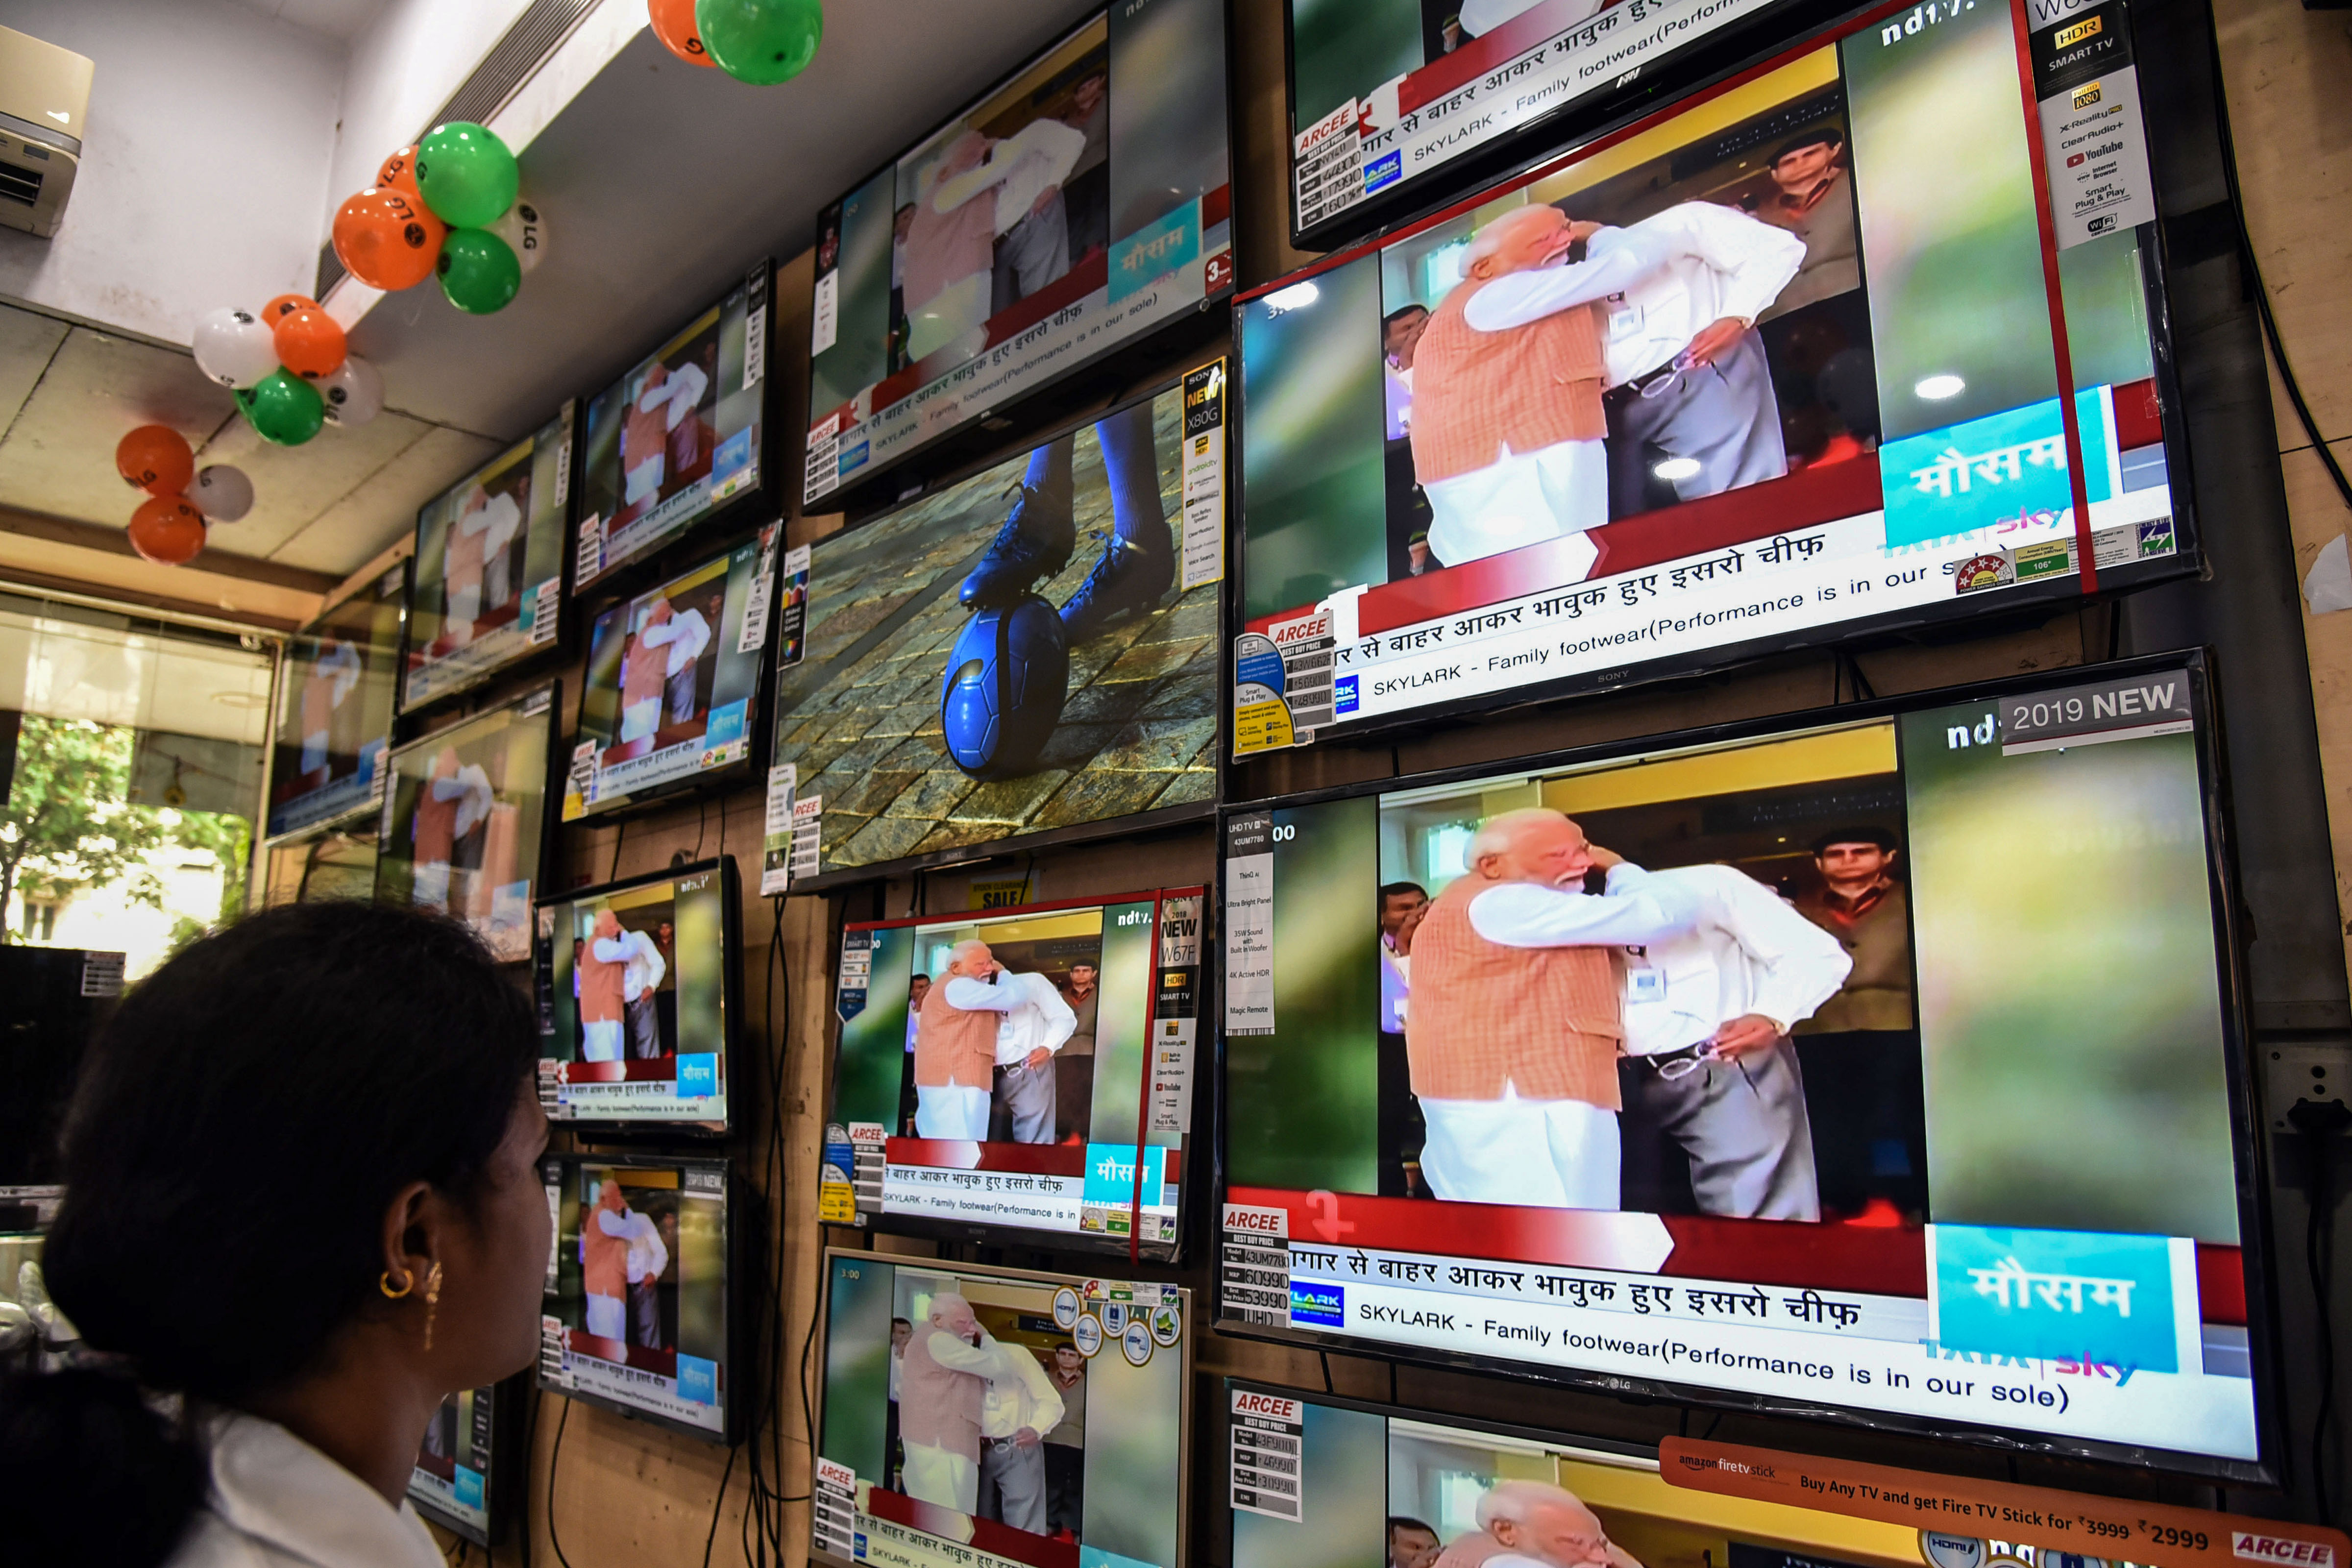 People watch Prime Minsiter Narendra Modi console Isro chief Dr K Sivan